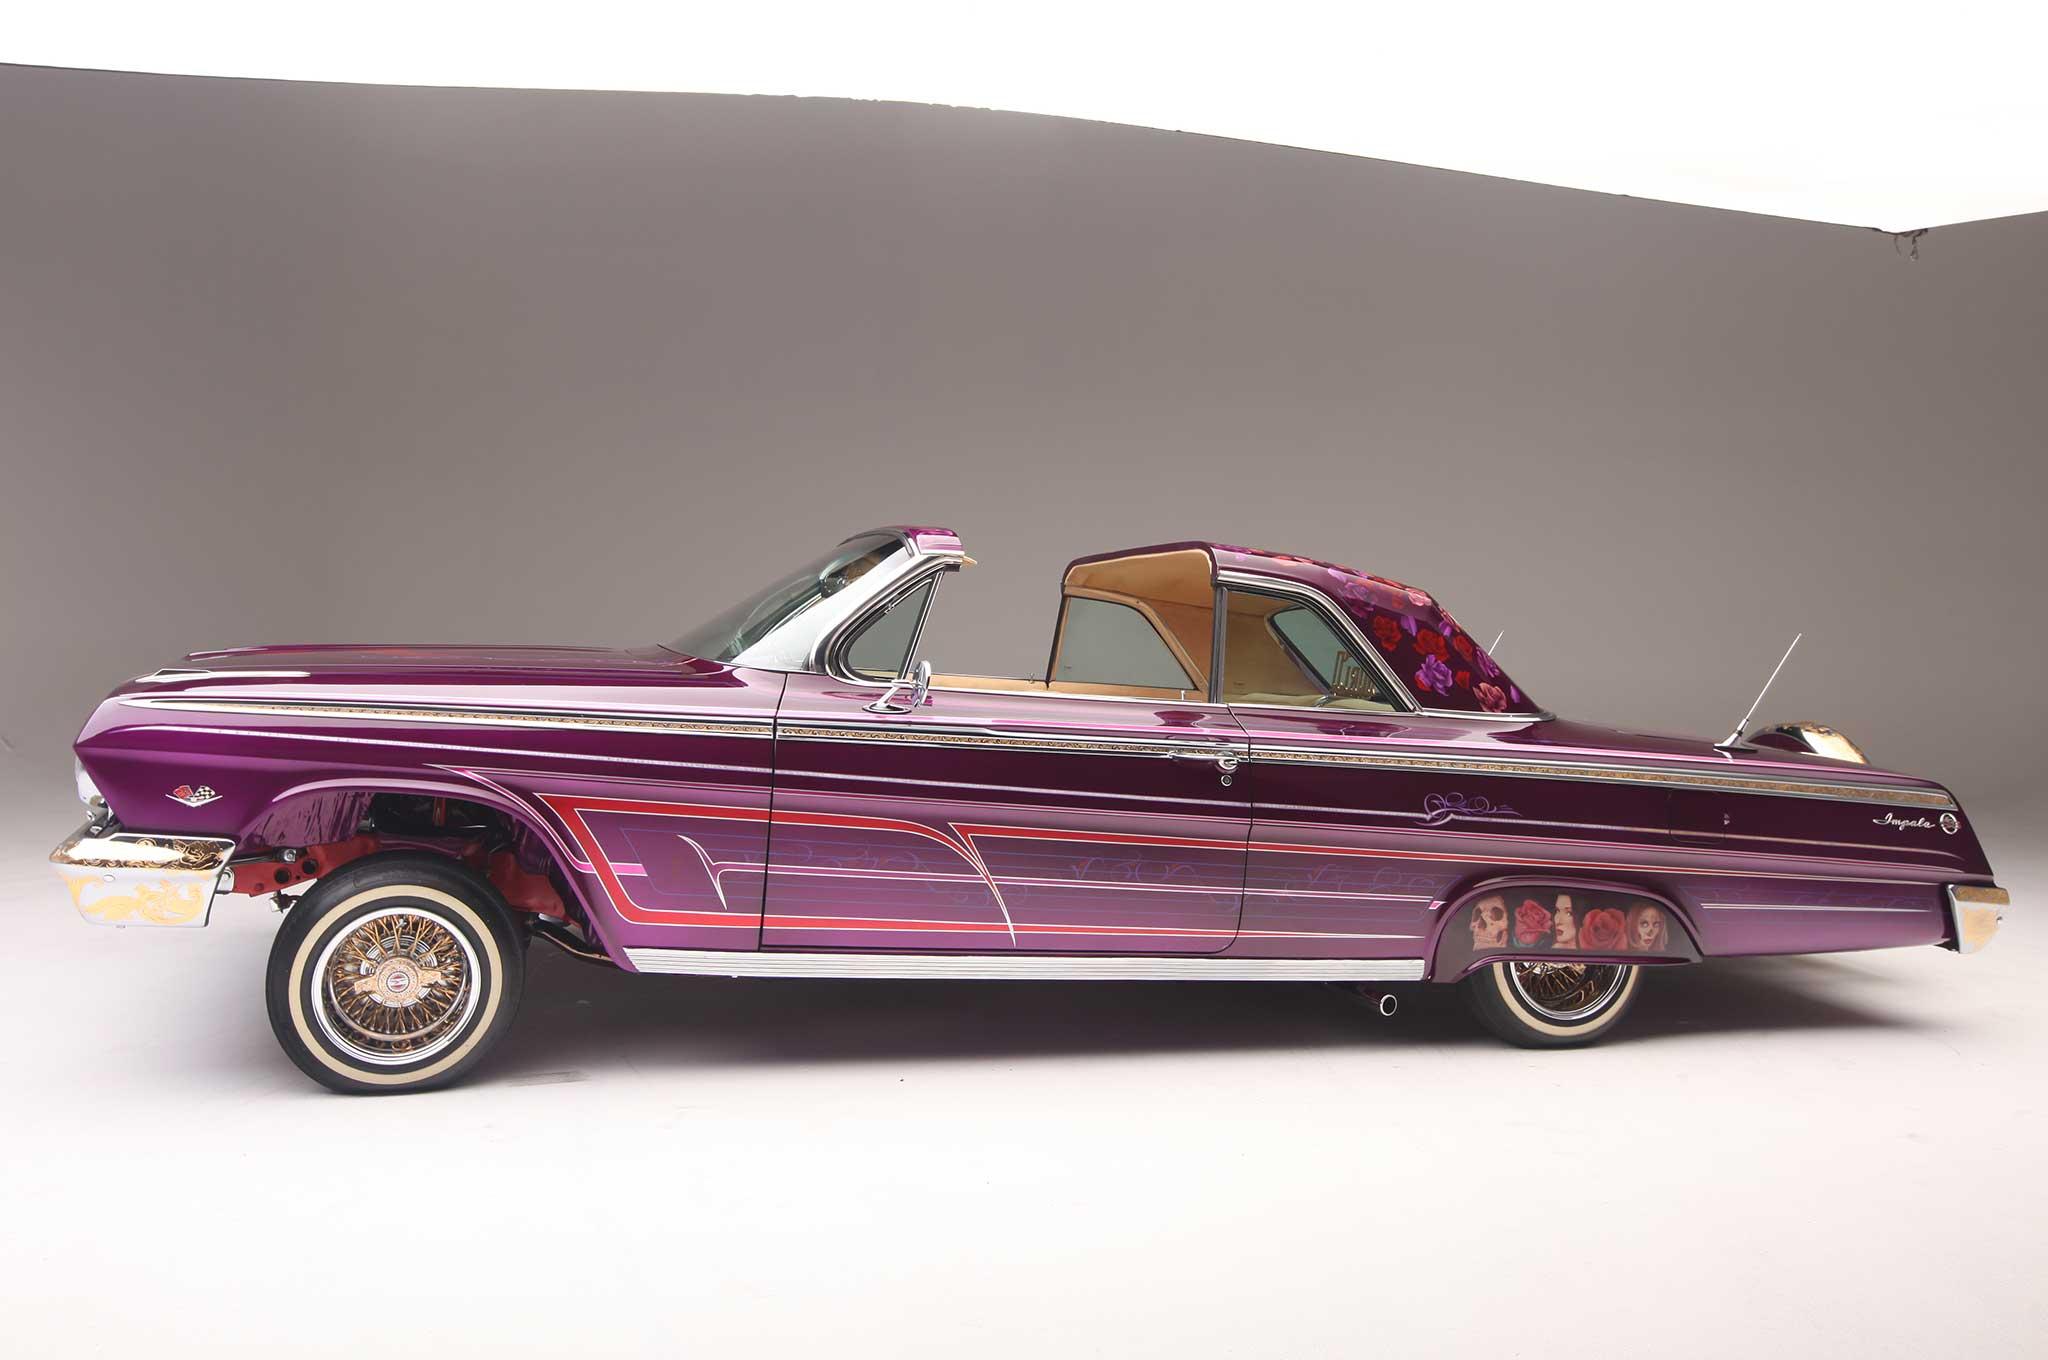 Lowrider Miami >> 1962 Chevrolet Impala SS - Right Hand Man - Lowrider